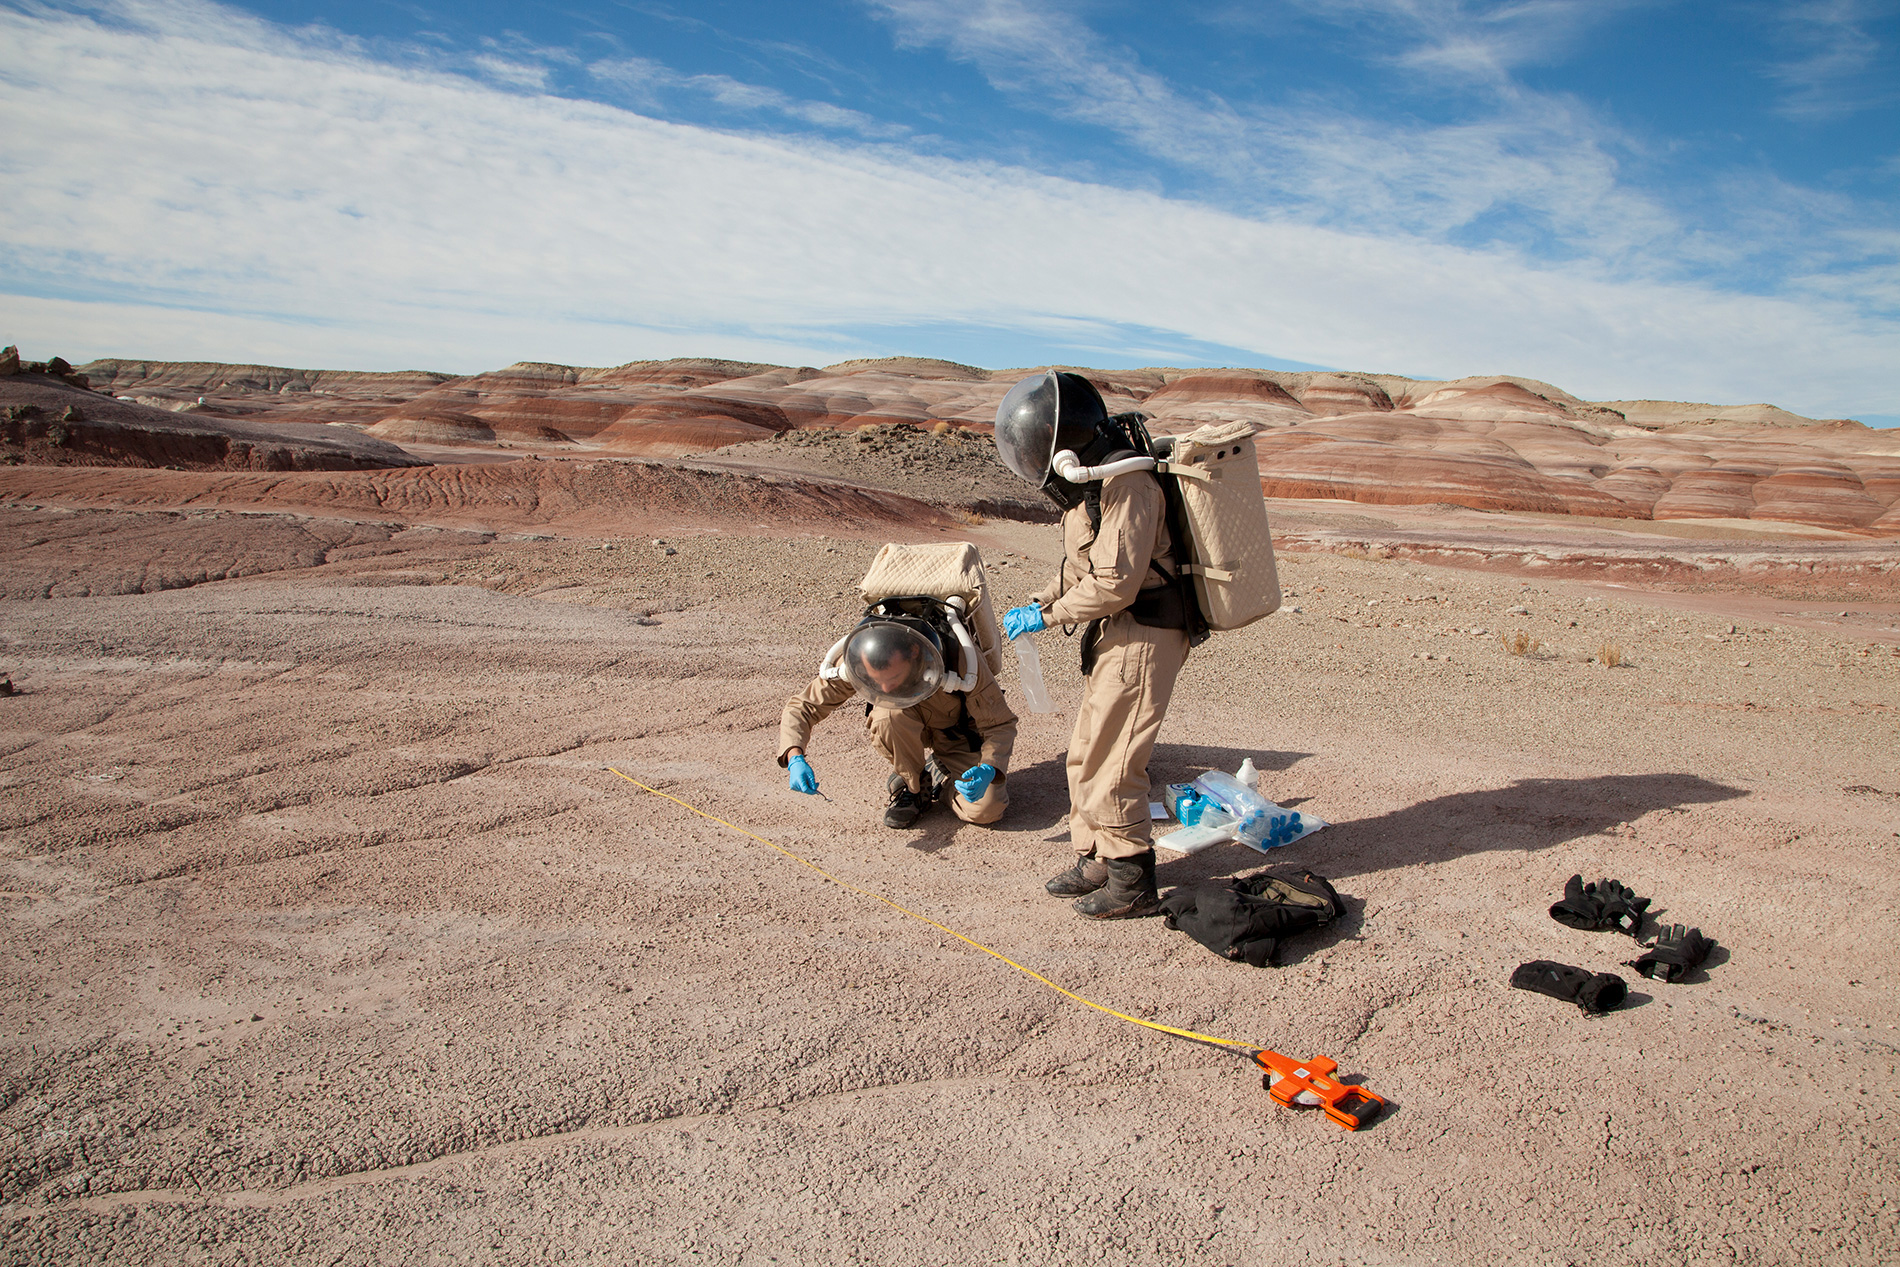 15 days on Mars